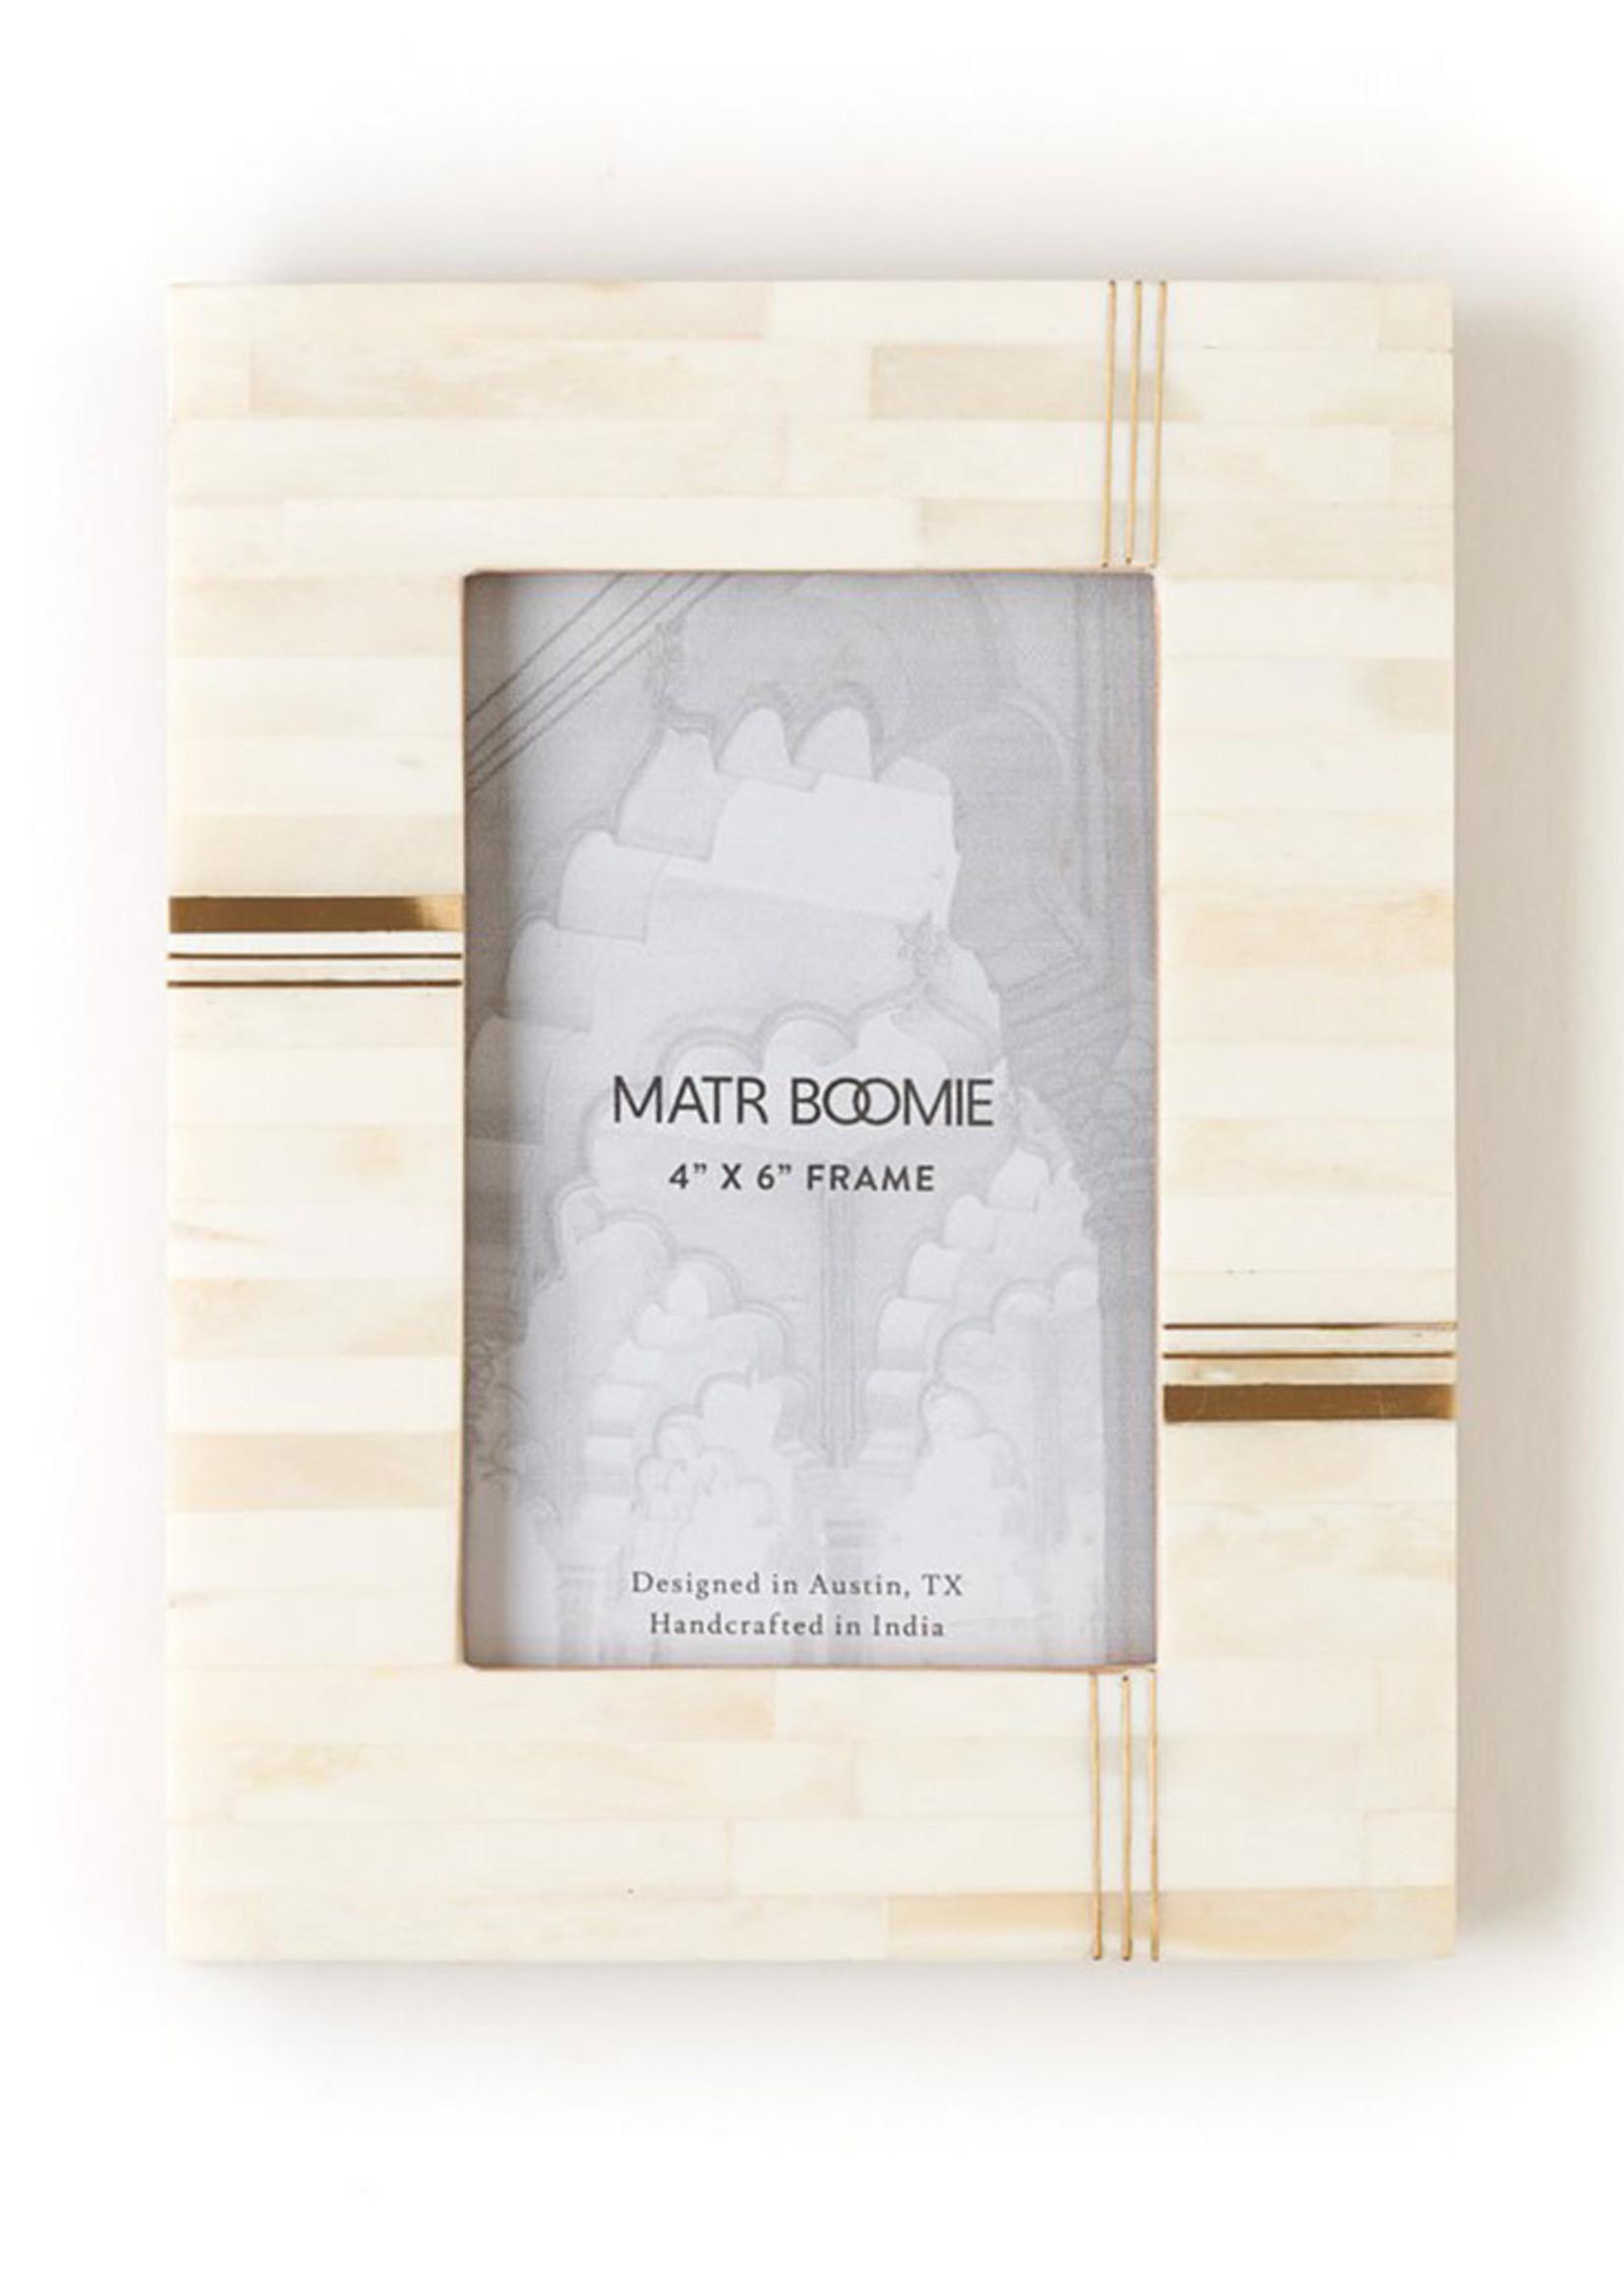 Matr Boomie Mukhendu Bar Picture Frame